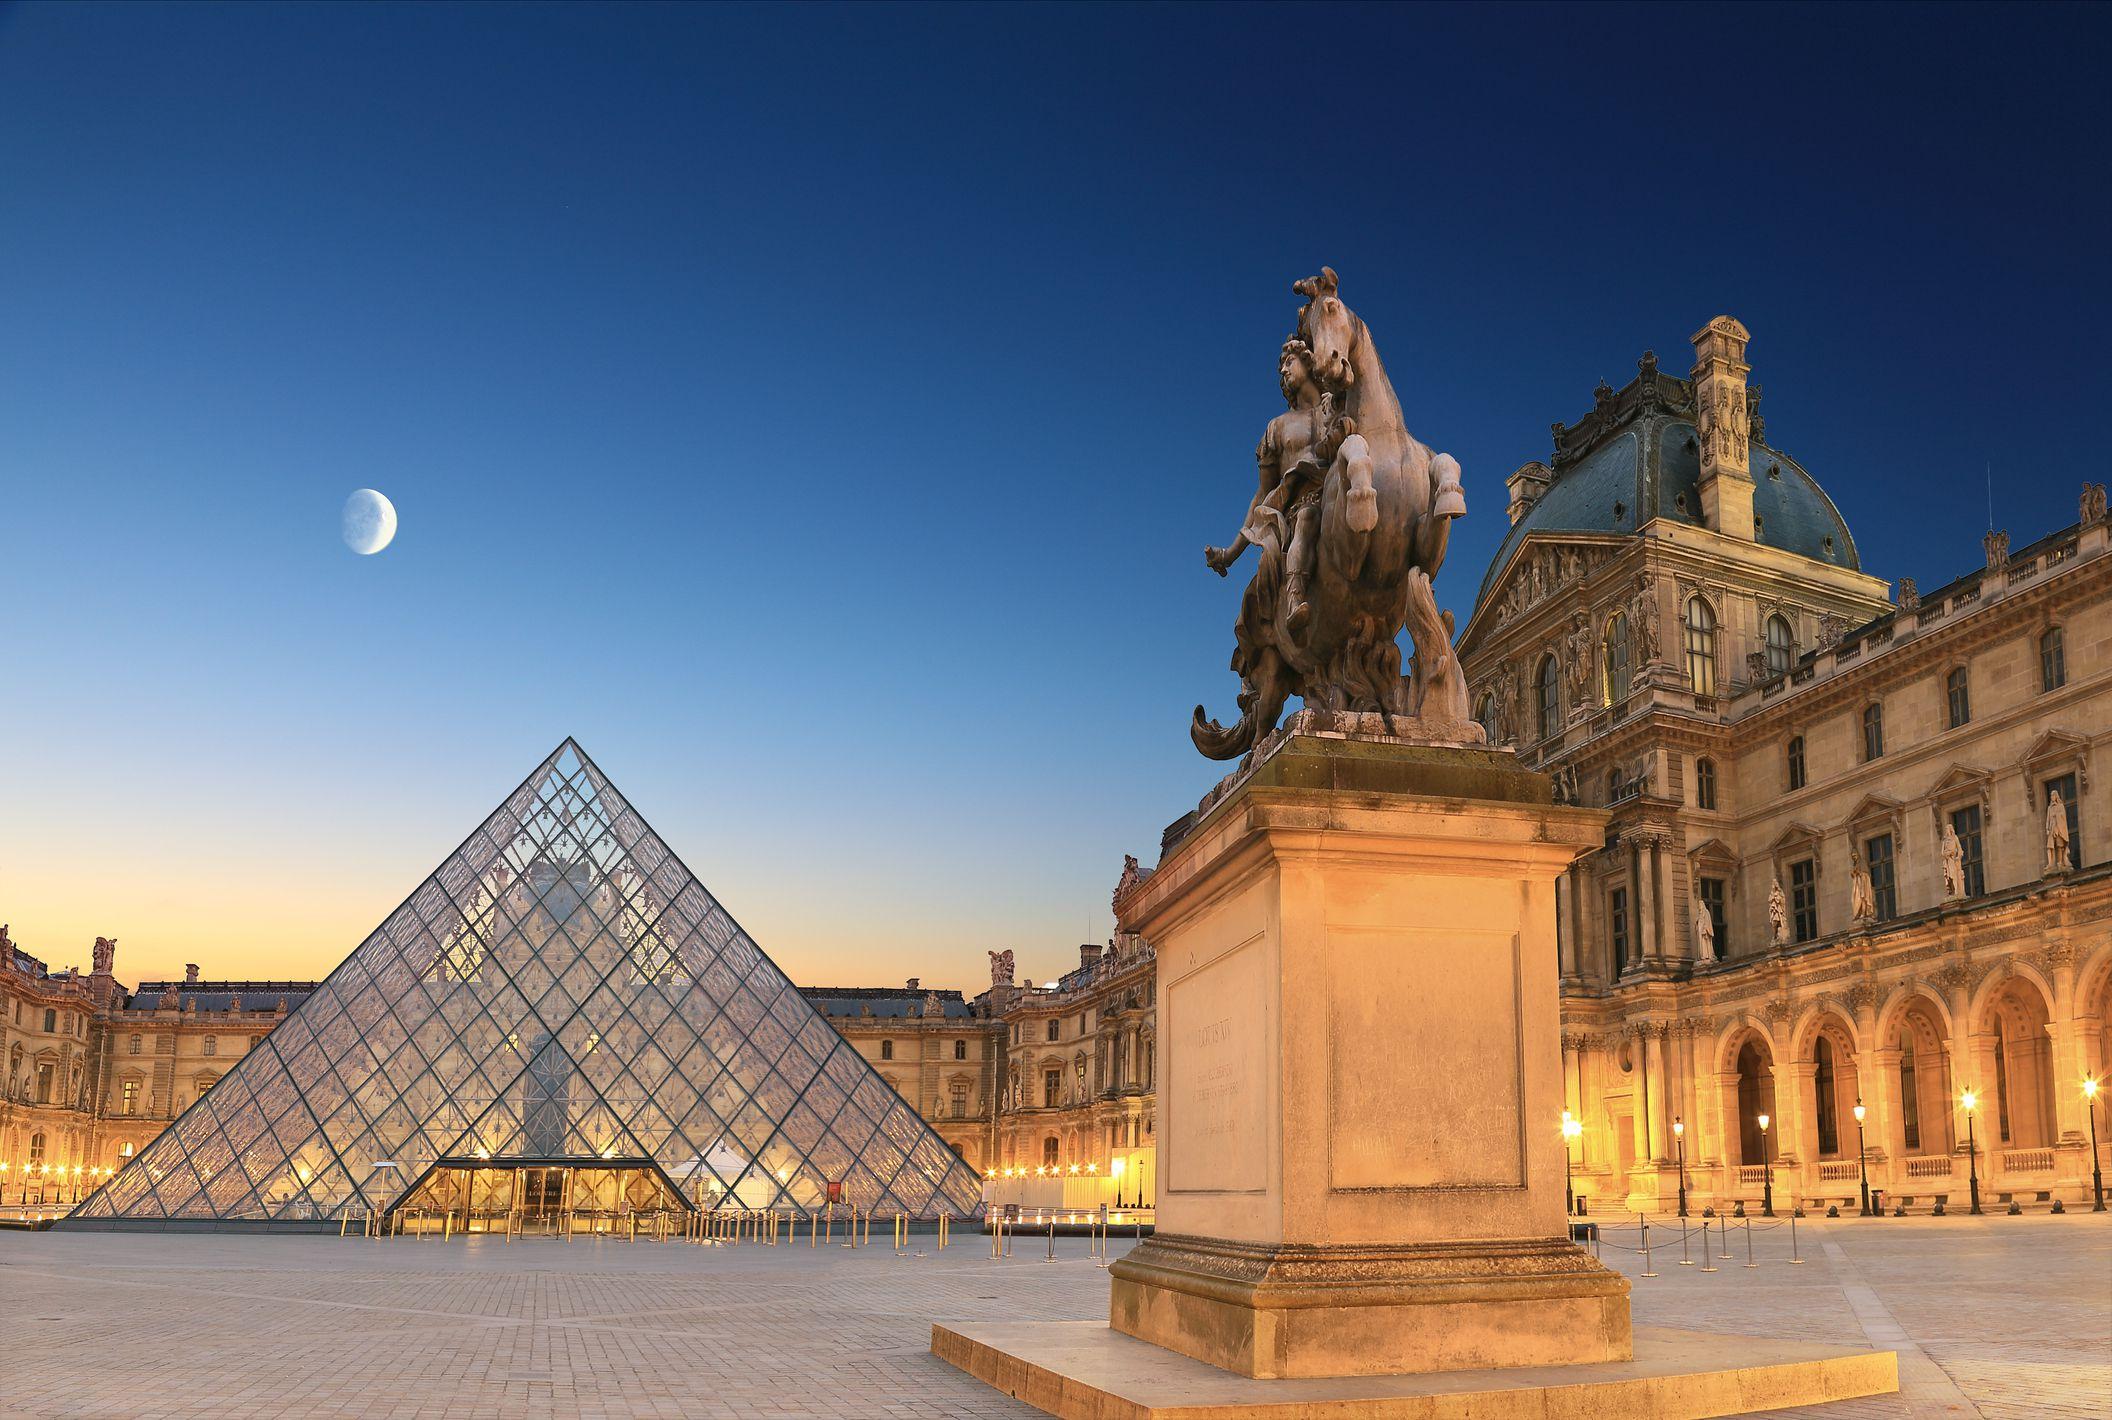 Art Car Museum >> How To Enjoy the Louvre Museum in Paris